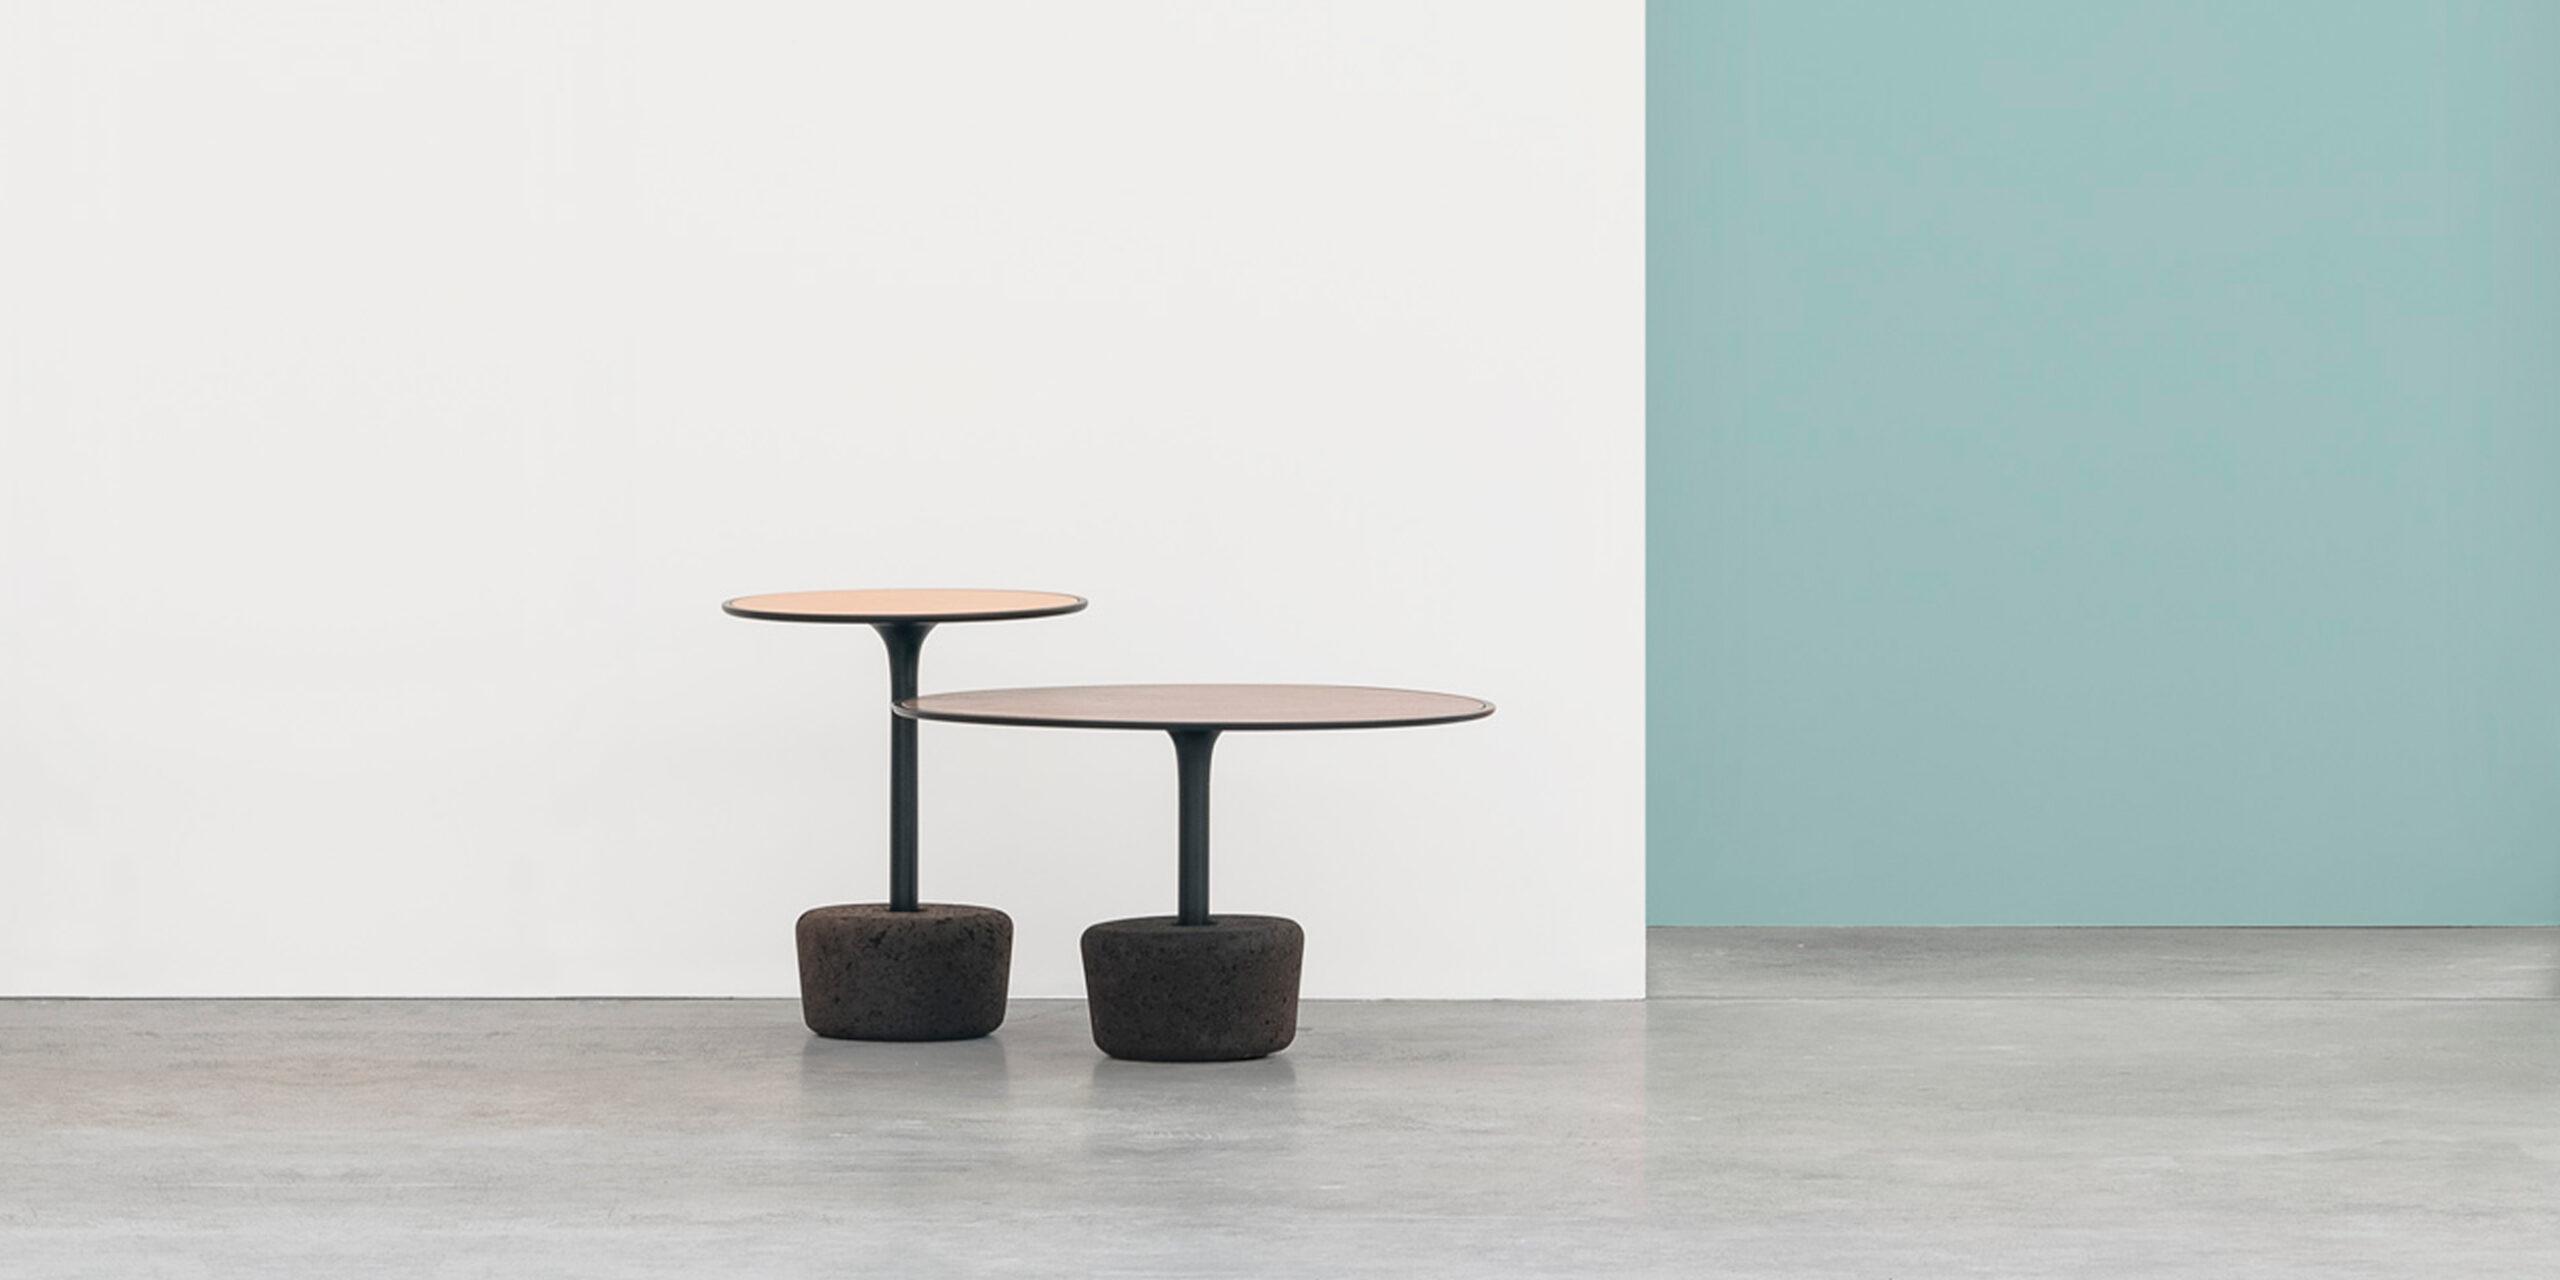 flora-table-wood-dam-portugal